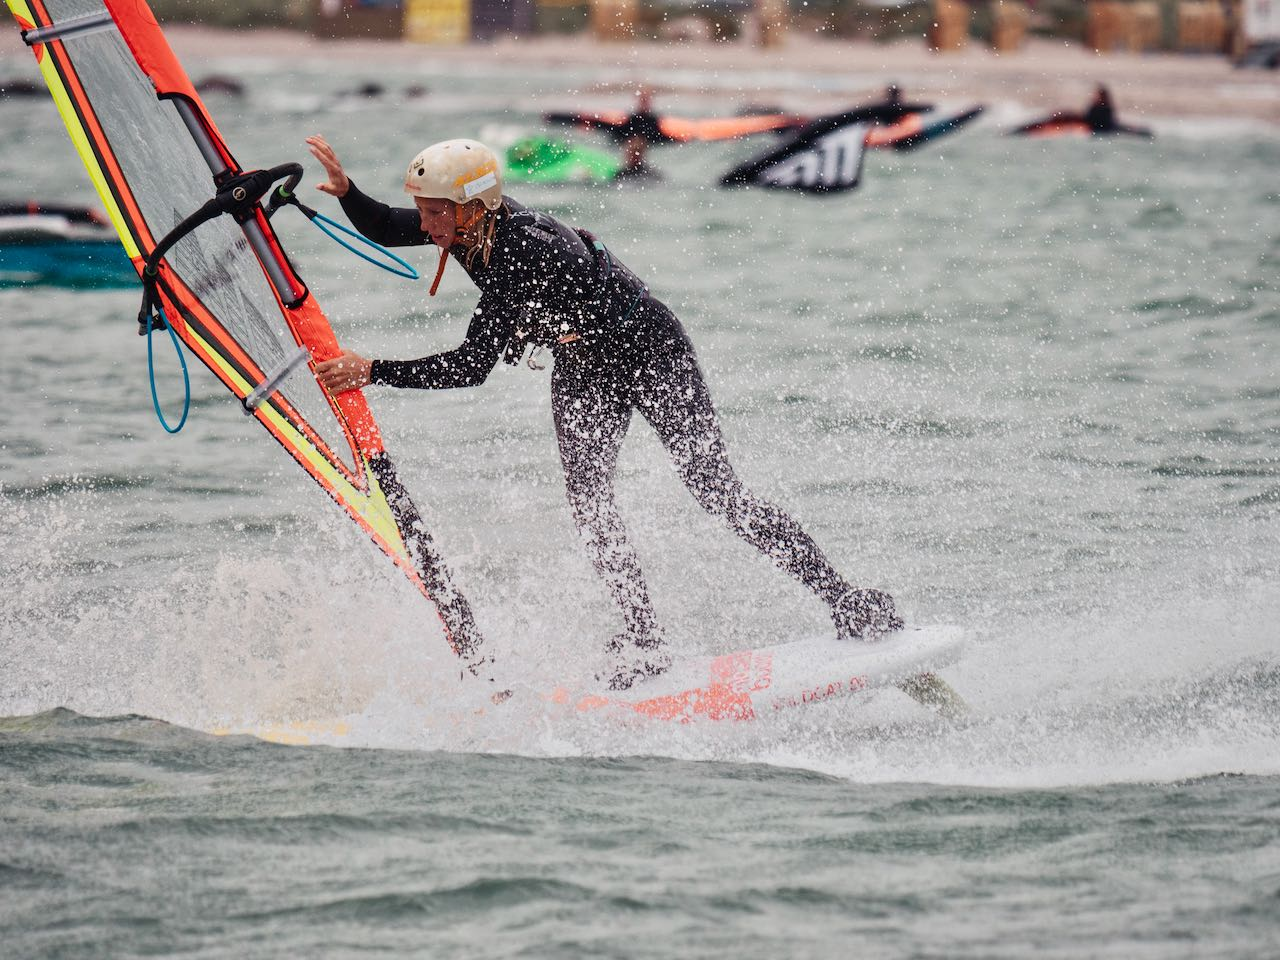 Lisa Kloster slides through a Spock at the Surf Festival 2021 (Photo by Valentin Boeckler).